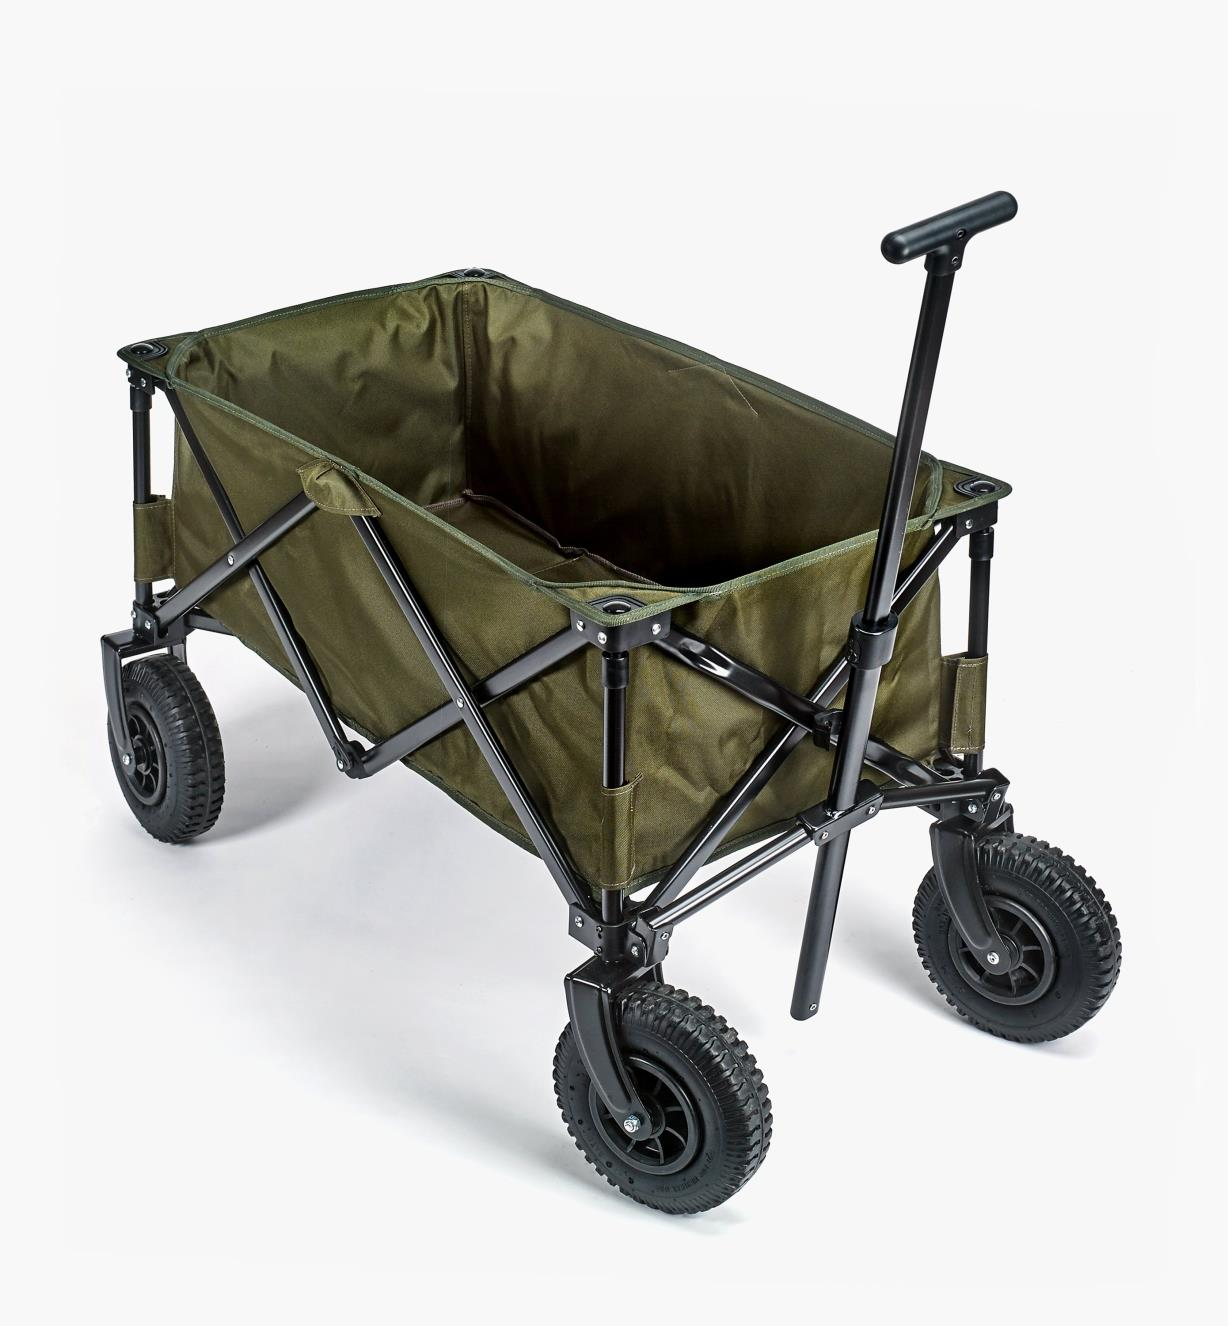 99W8991 - Chariot pliant